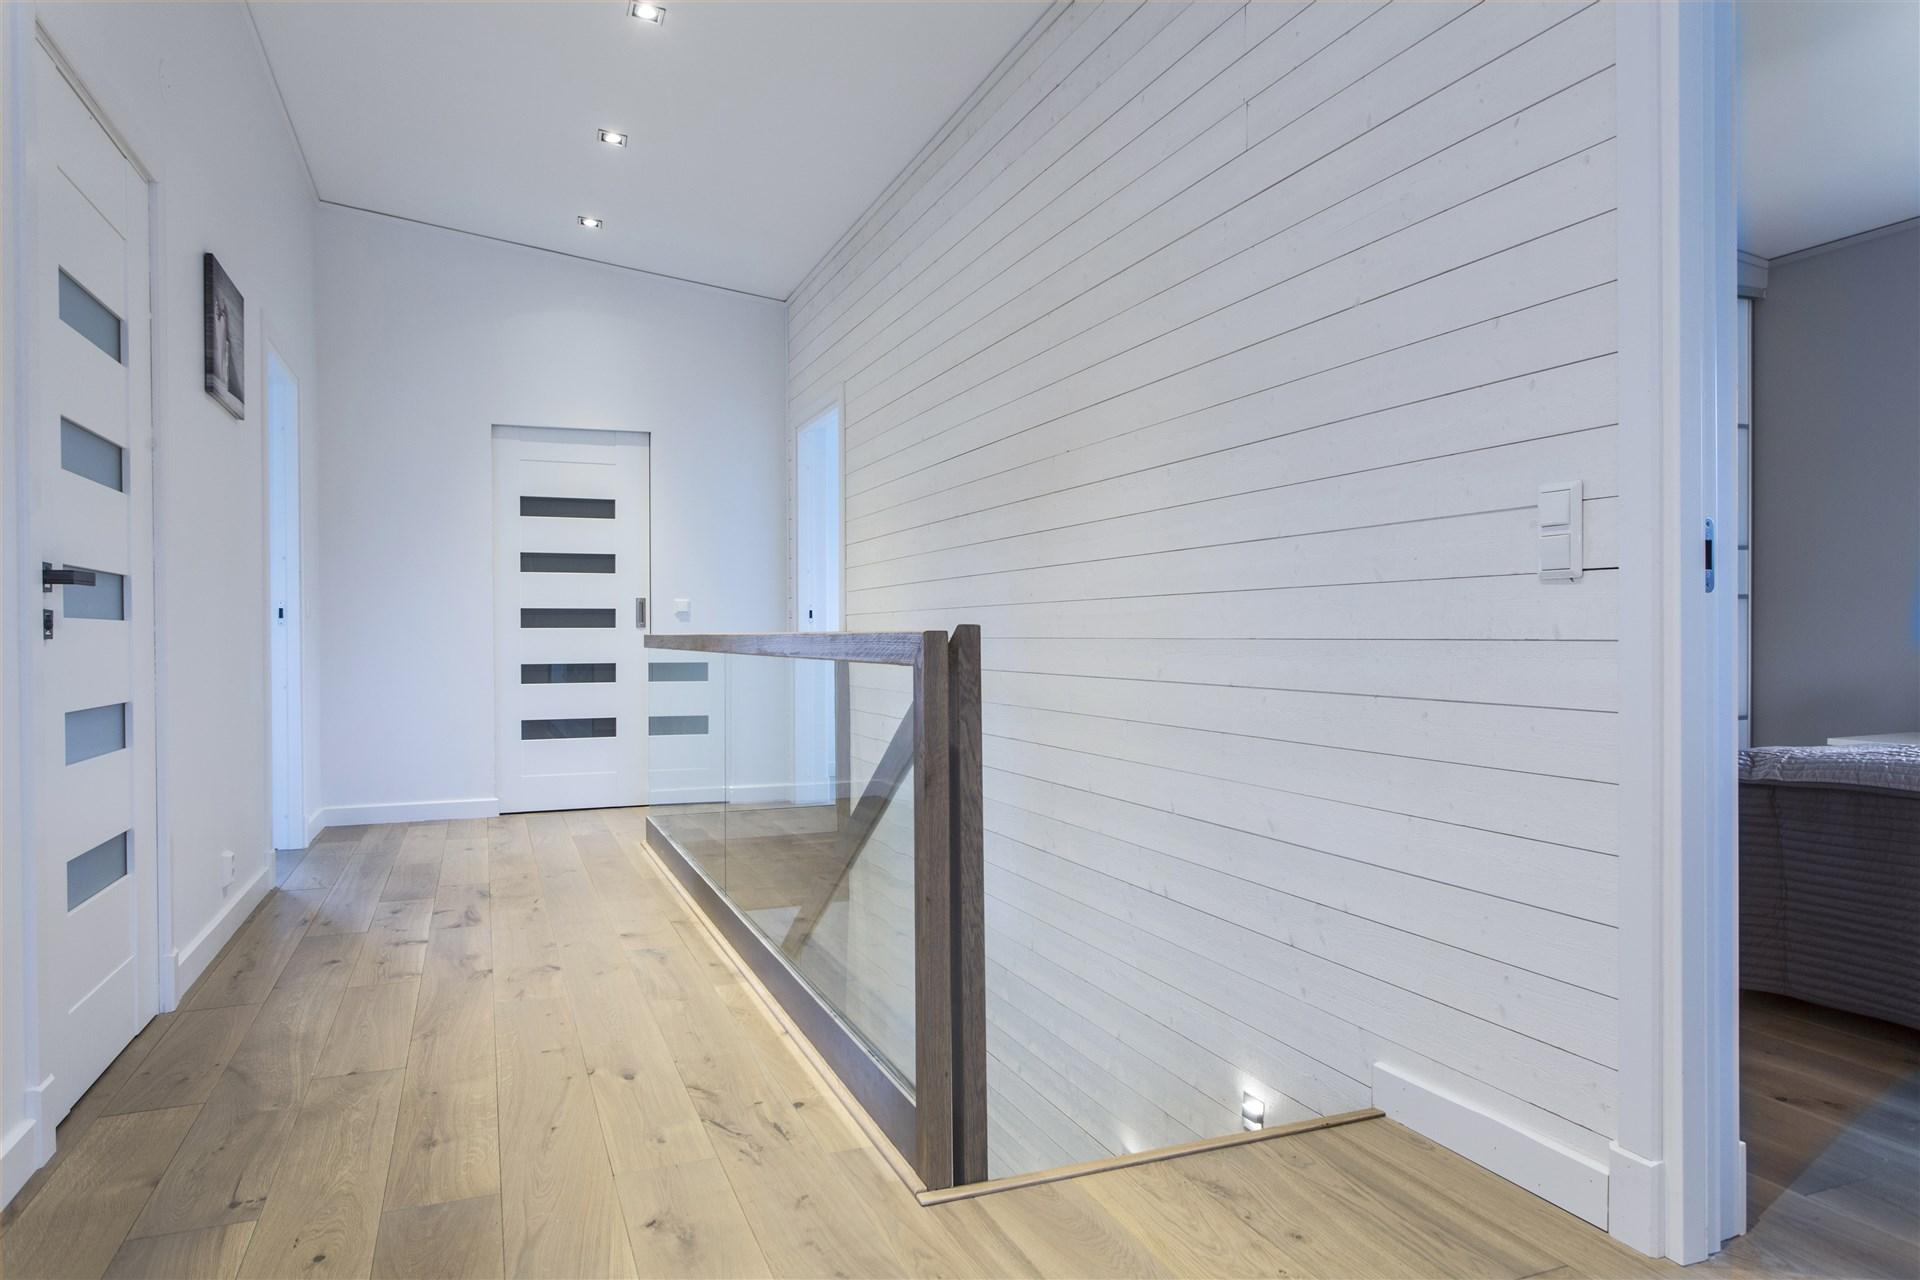 Luftig hall på övre plan med liggande panel.